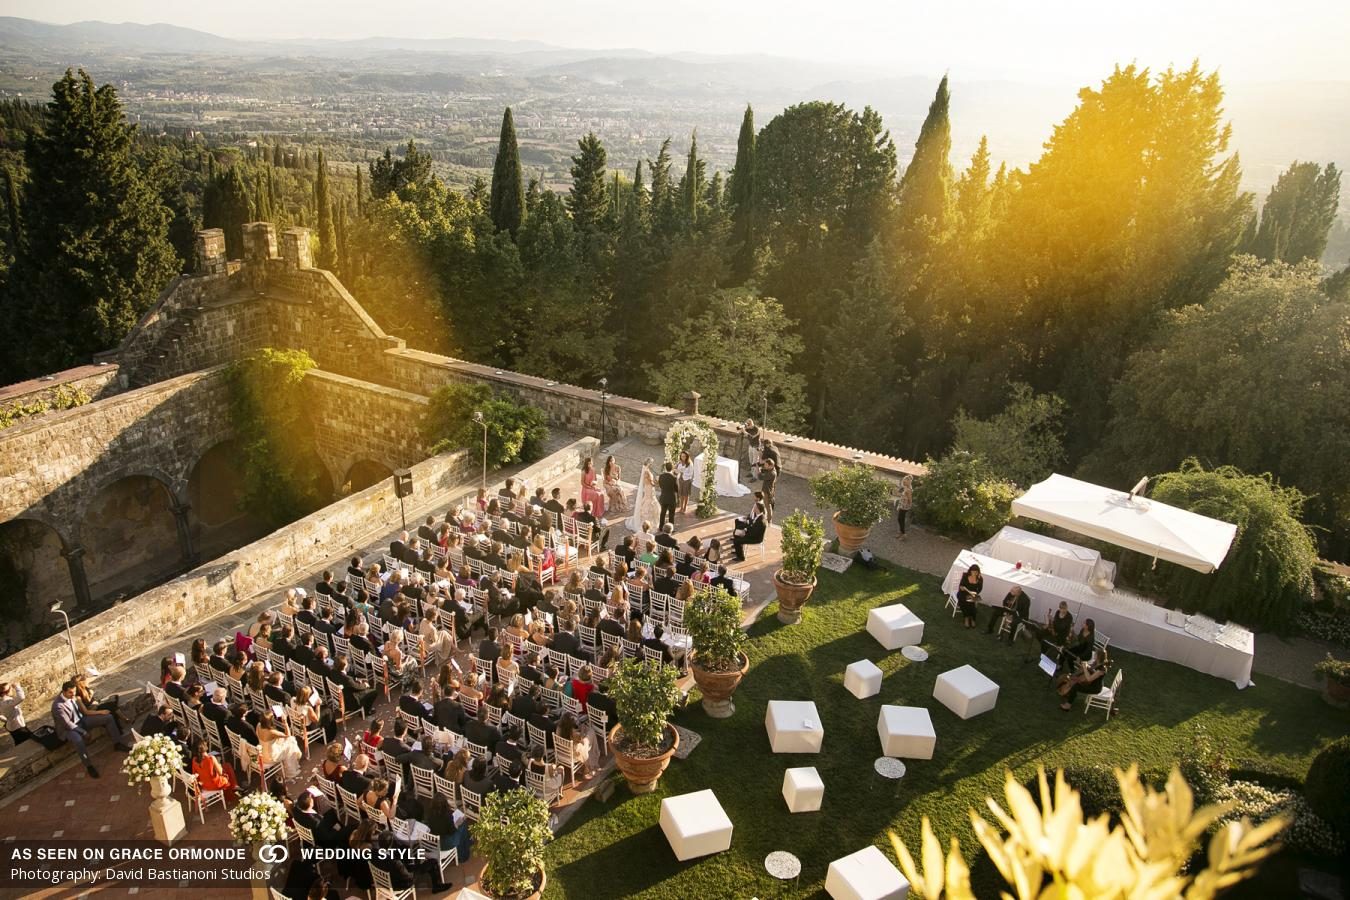 david-bastianoni-wedding-2015-05_0 :: Grace Ormonde :: Luxury wedding photography - 1 :: david-bastianoni-wedding-2015-05_0